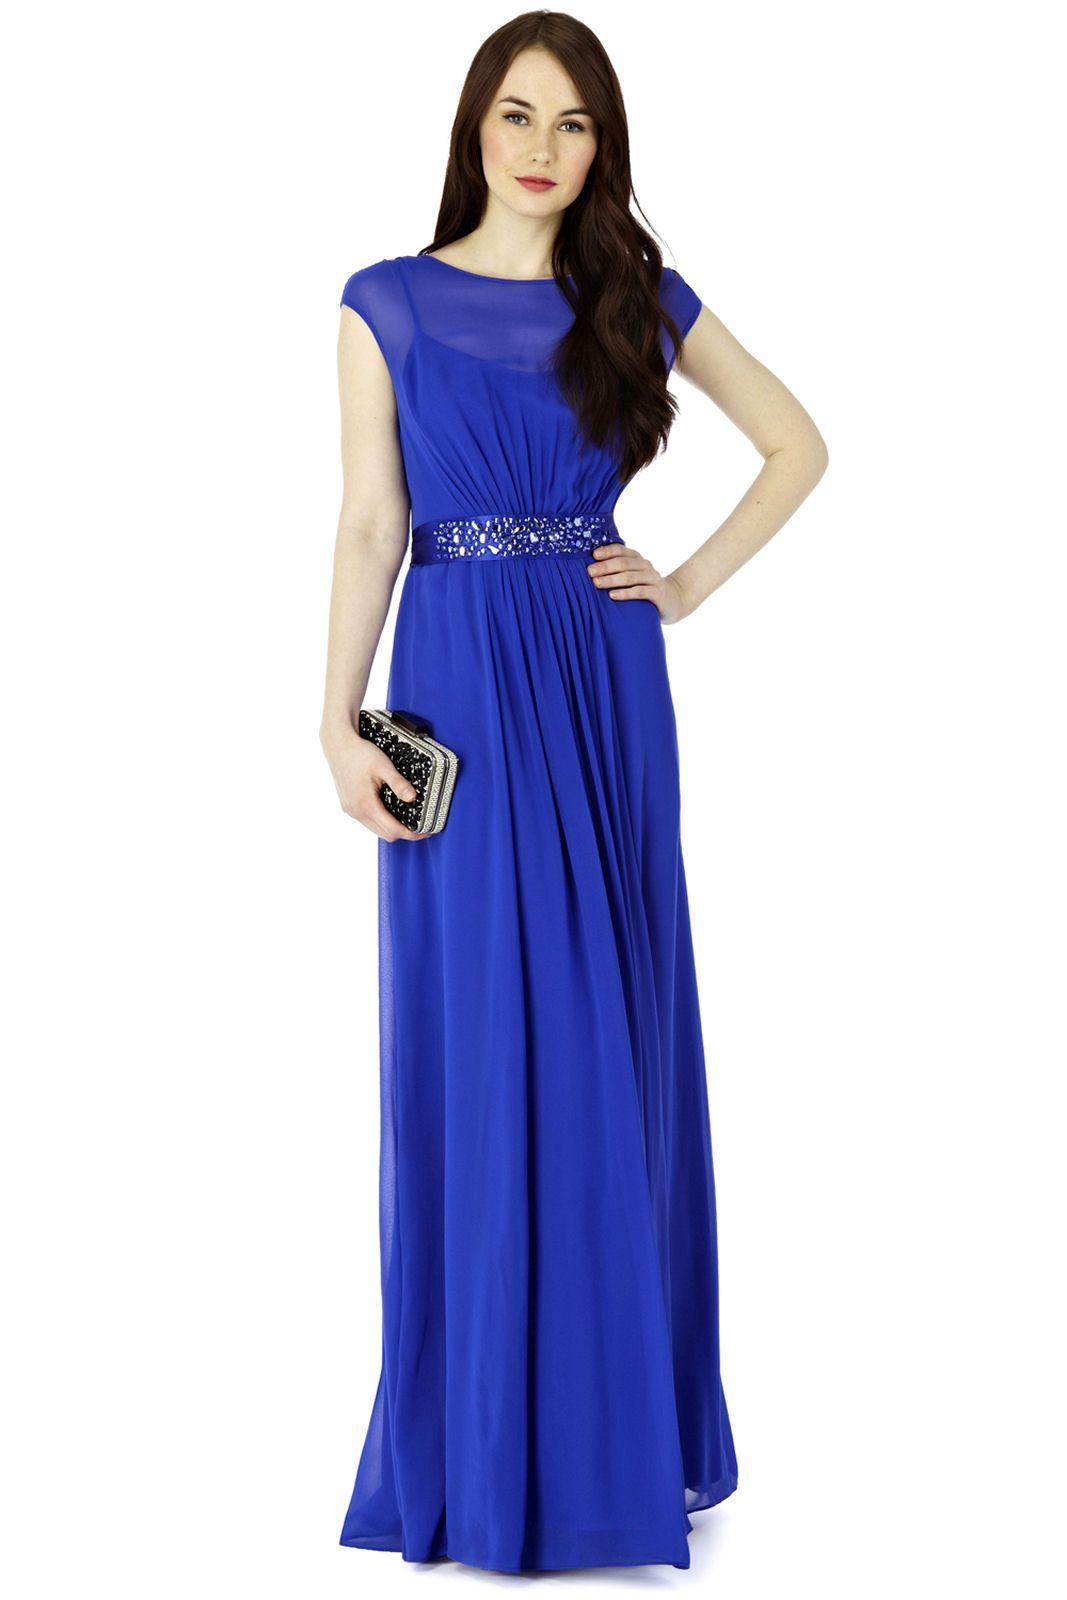 Cobalt blue bridesmaid dresses lori lee maxi dress cobalt blue cobalt blue bridesmaid dresses lori lee maxi dress cobalt blue from coast bridesmaid ombrellifo Choice Image